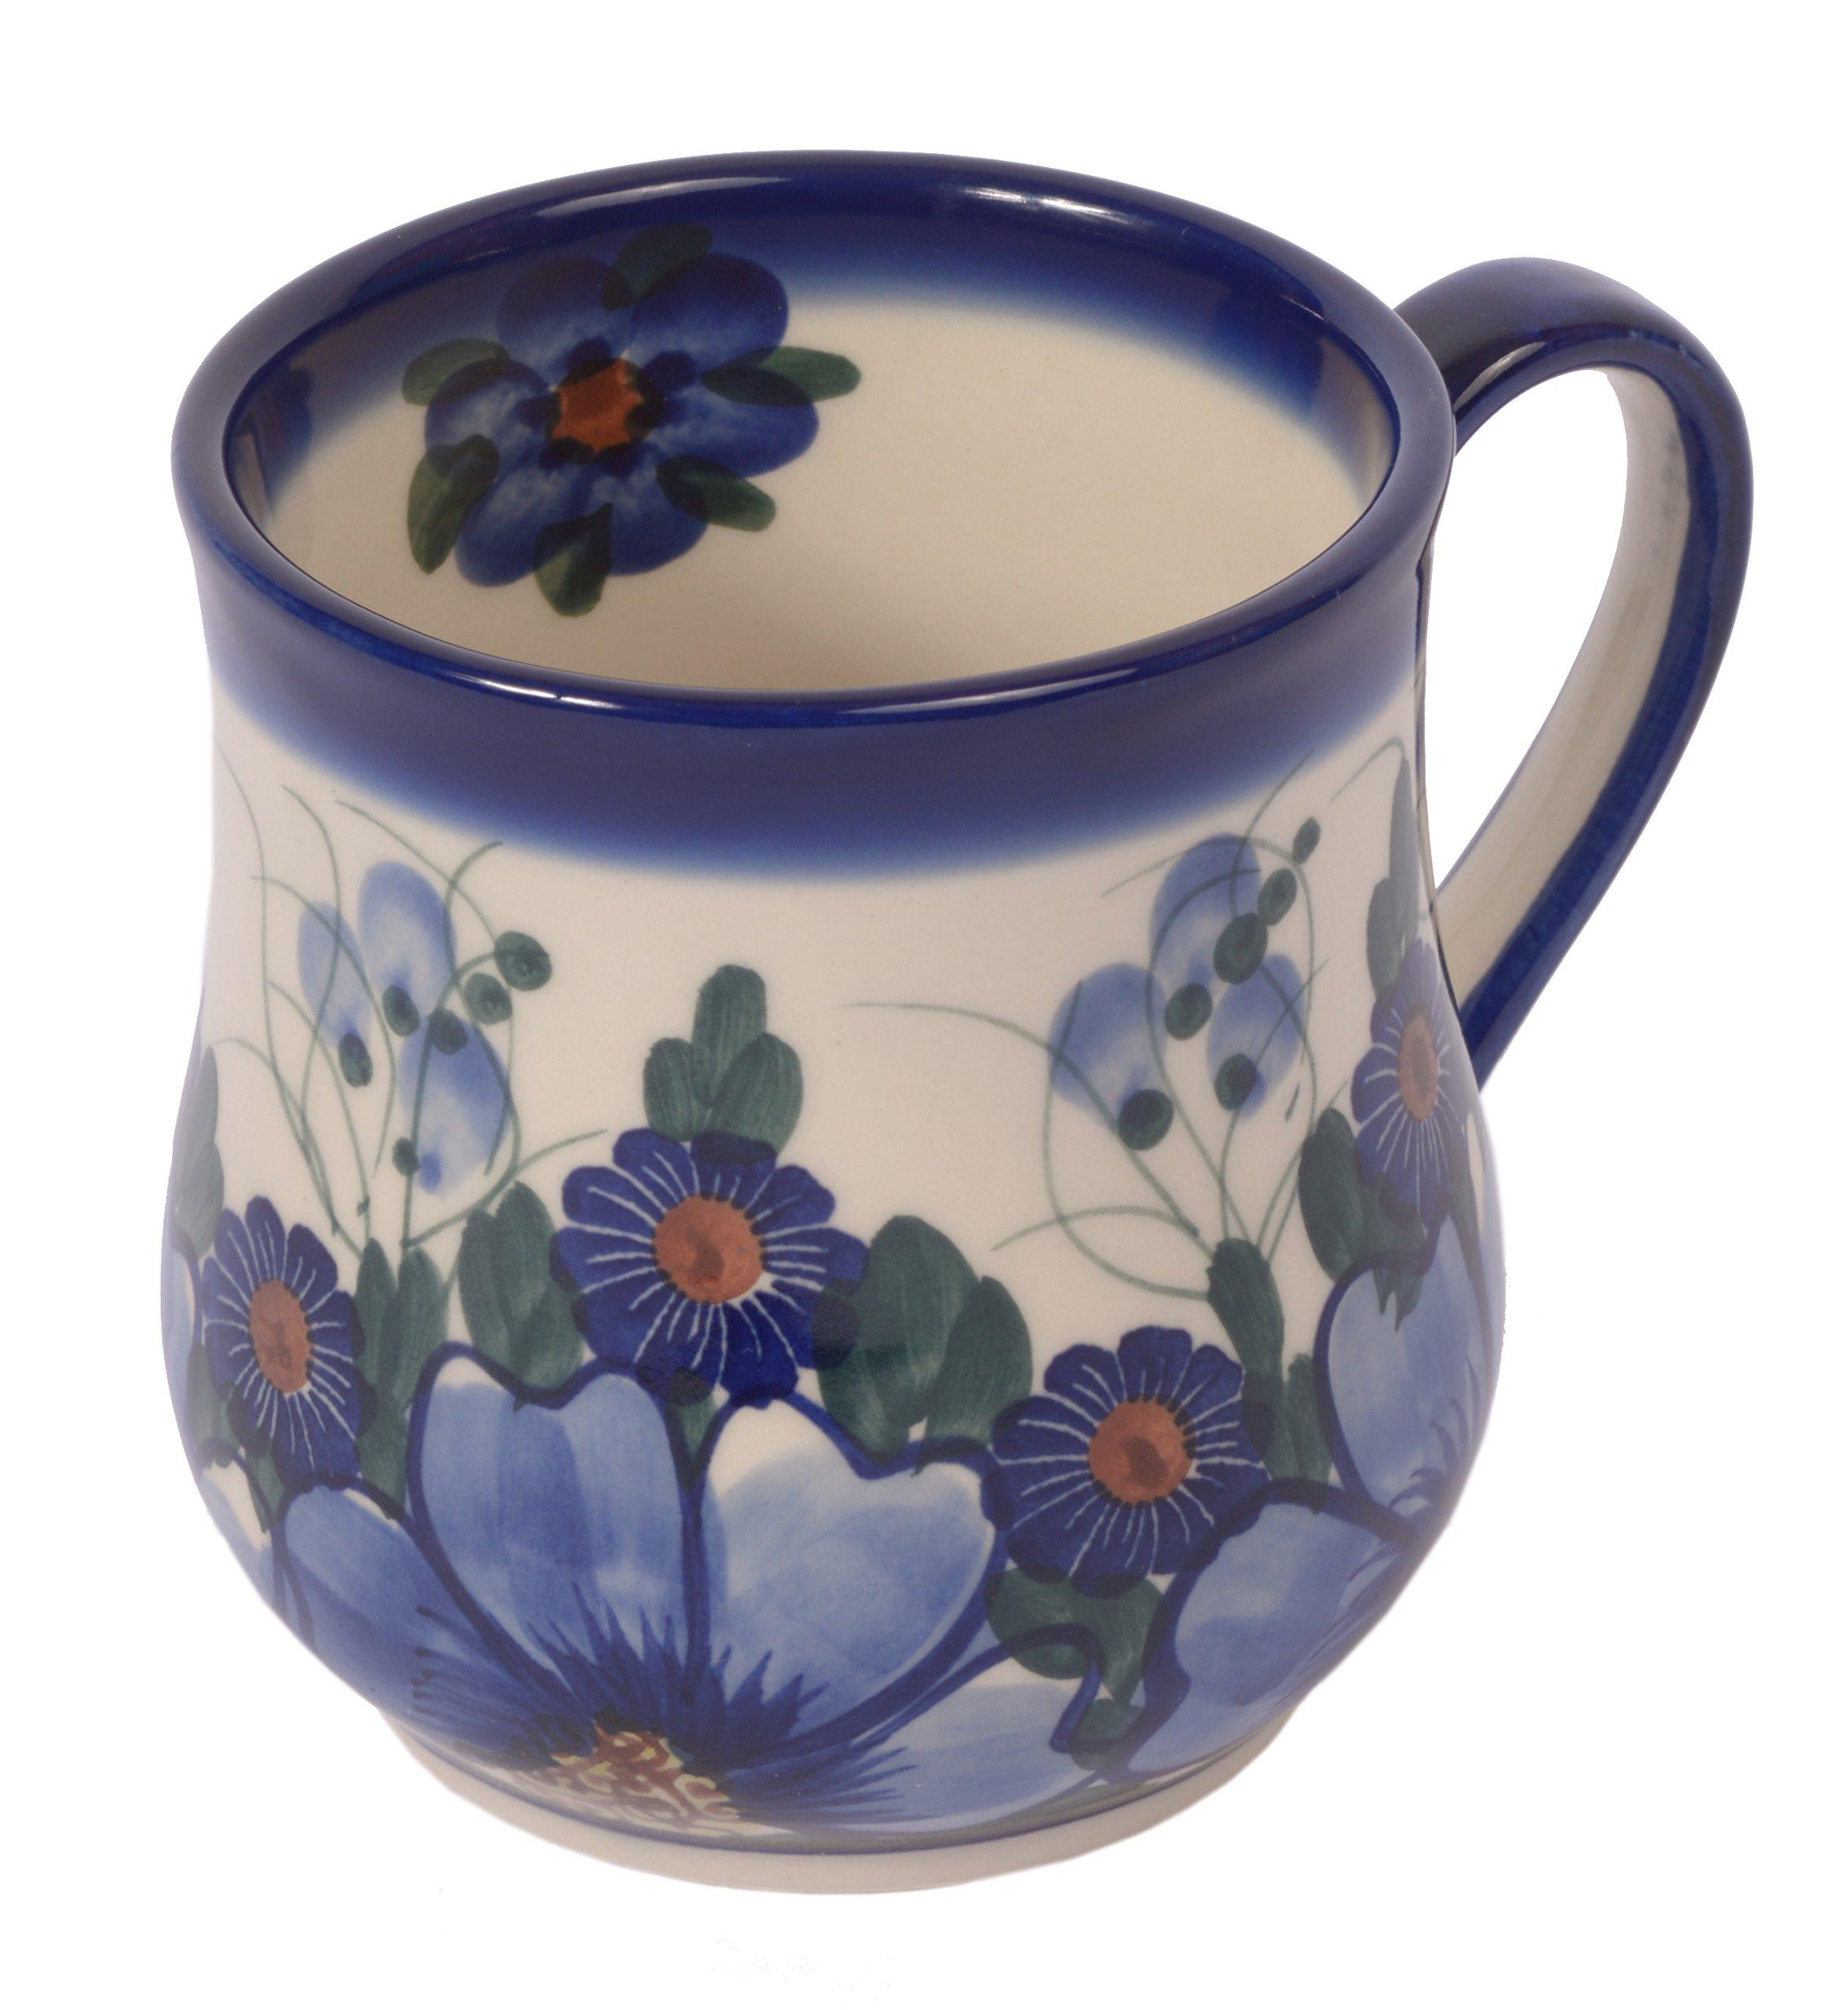 Traditional Polish Pottery, Handcrafted Ceramic Drop-shaped Mug (350 ml /12.3 fl oz), Boleslawiec Style Pattern, Q.102.PASSION